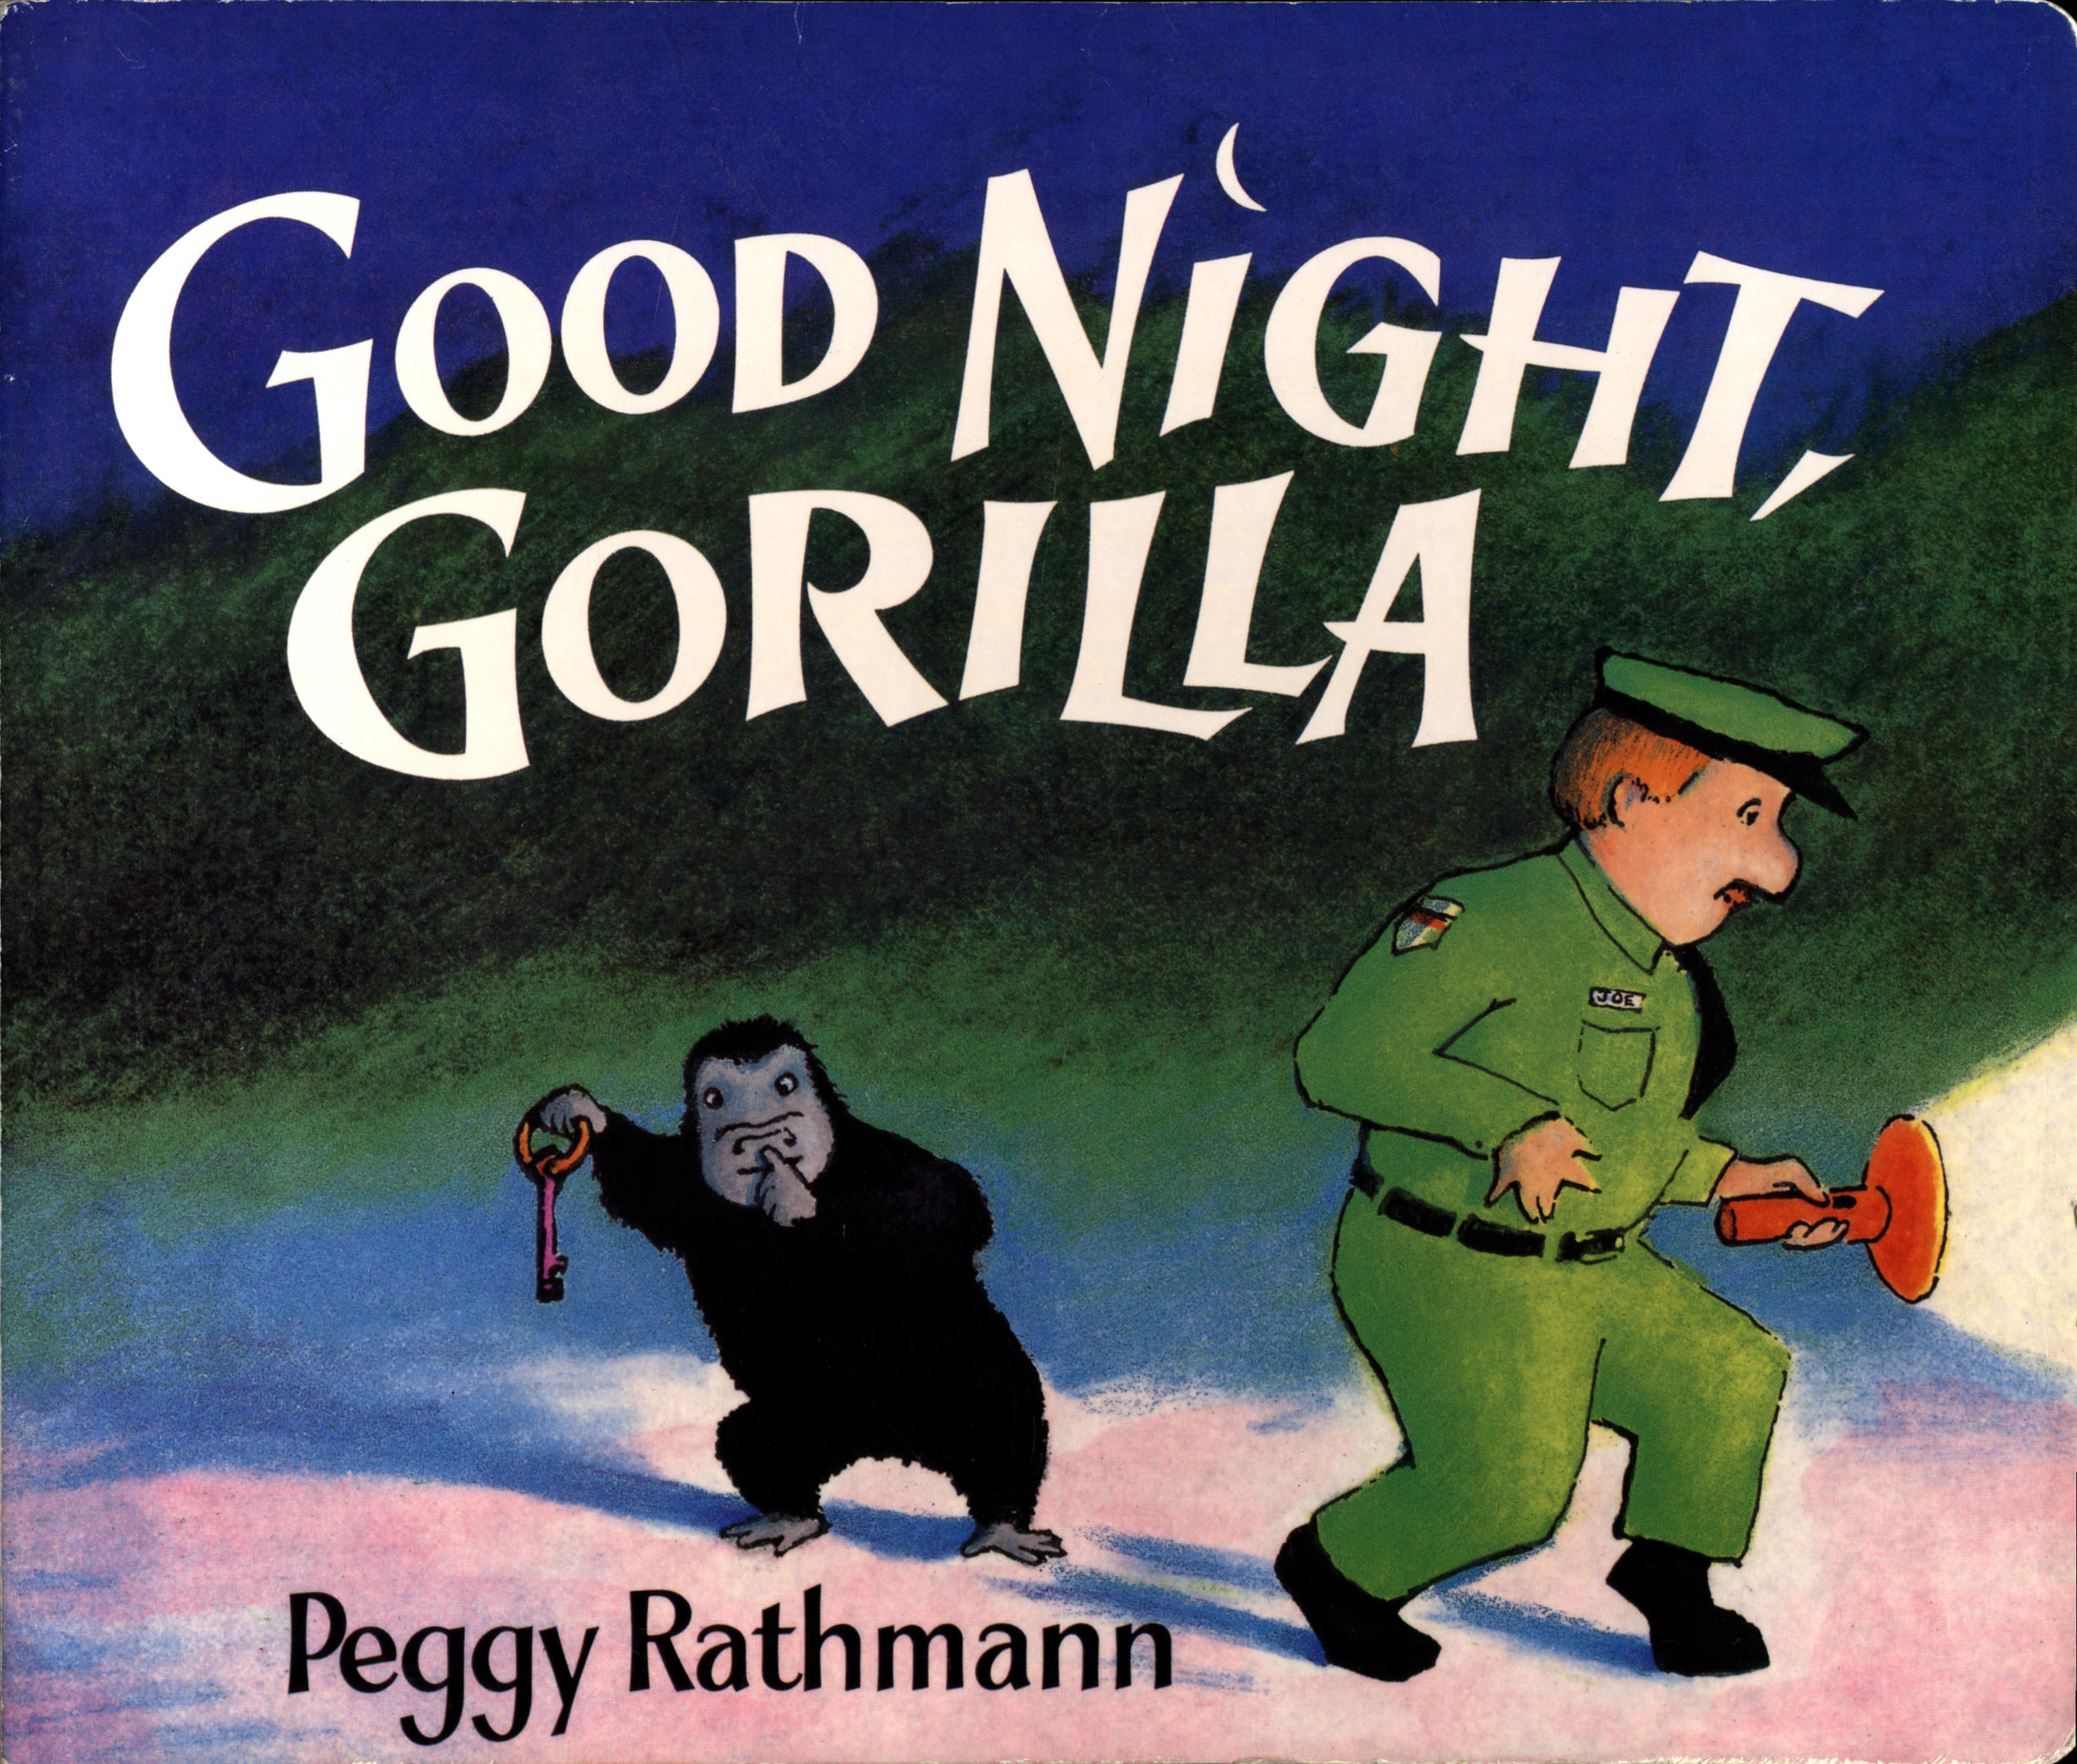 cover, good night gorilla